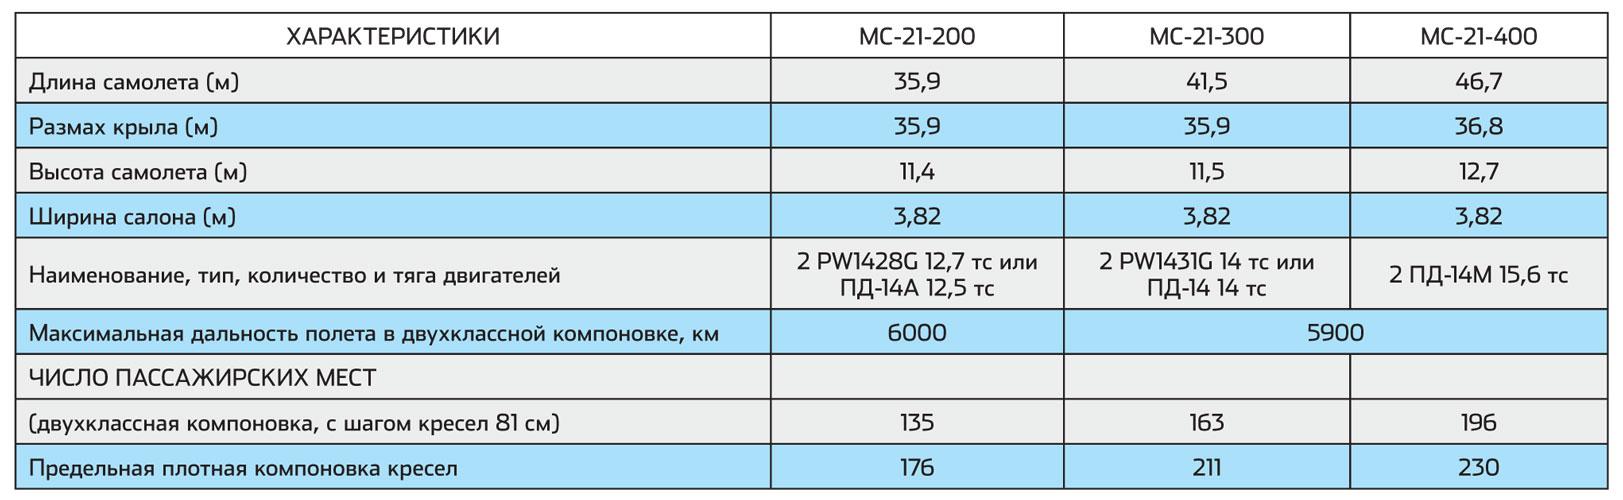 Таблица технических характеристик самолета